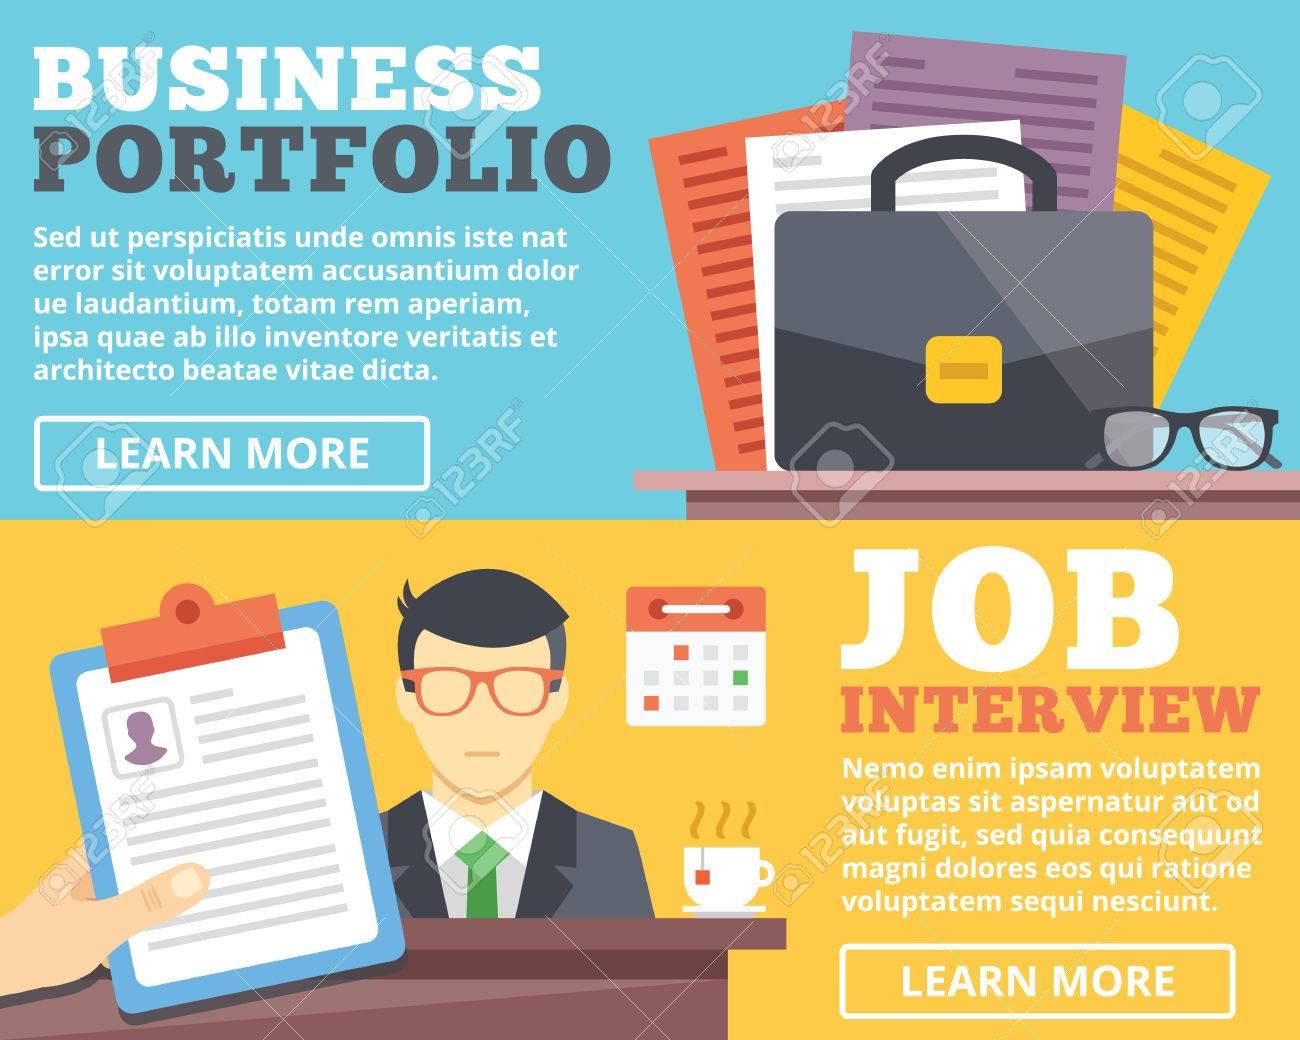 business portfolio job interview flat illustration concepts set business portfolio job interview flat illustration concepts set stock vector 41667057